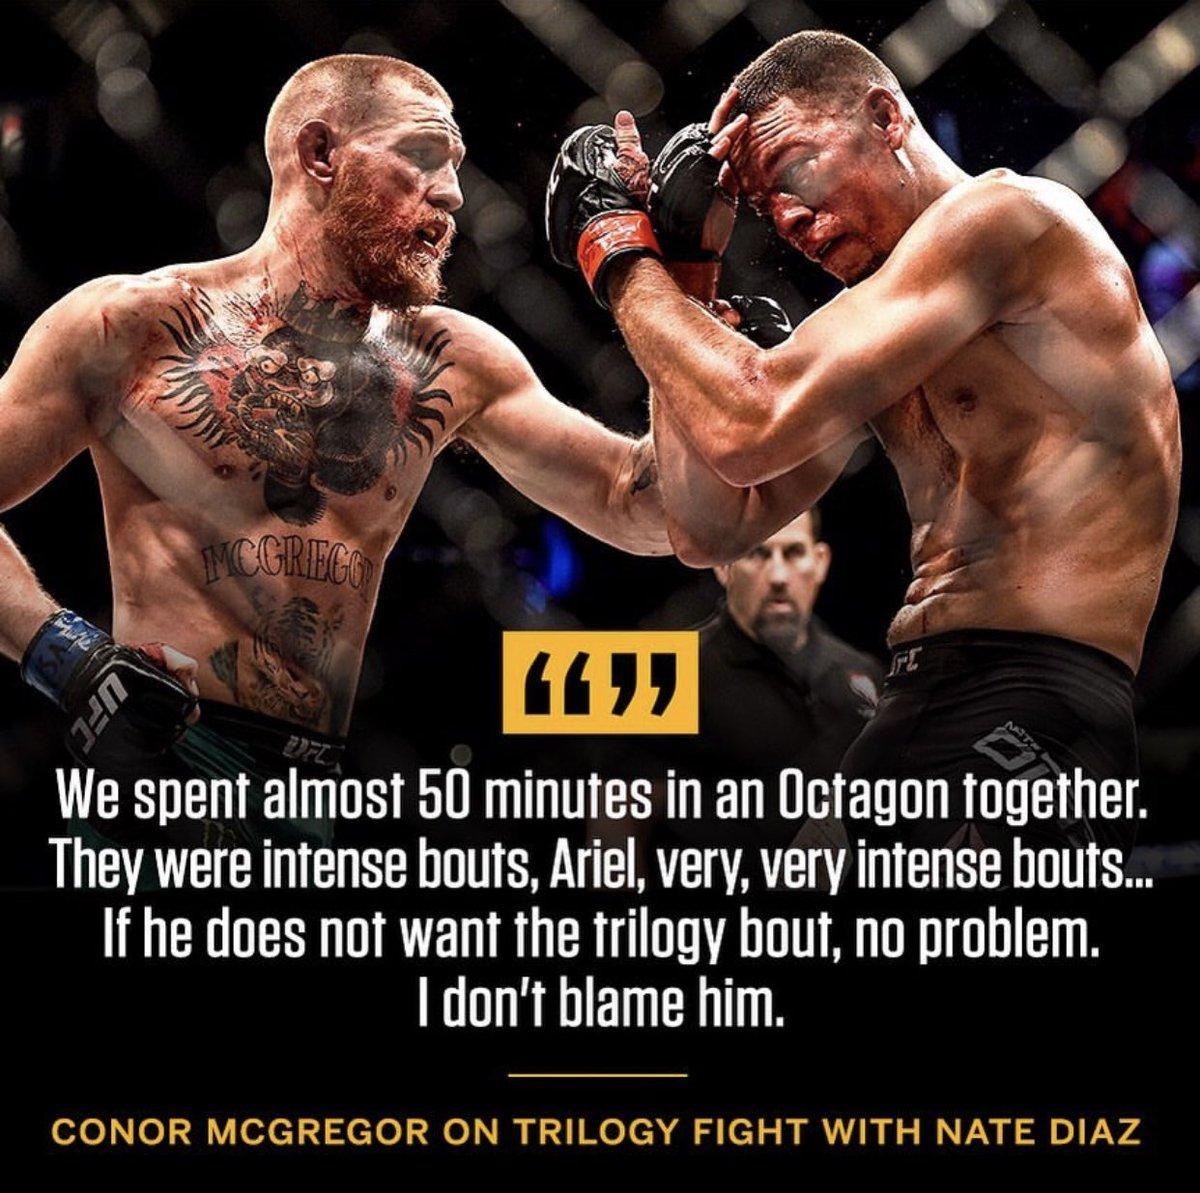 Conor won't wait for Nate (via @arielhelwani) https://t.co/Zgry9ZF57R